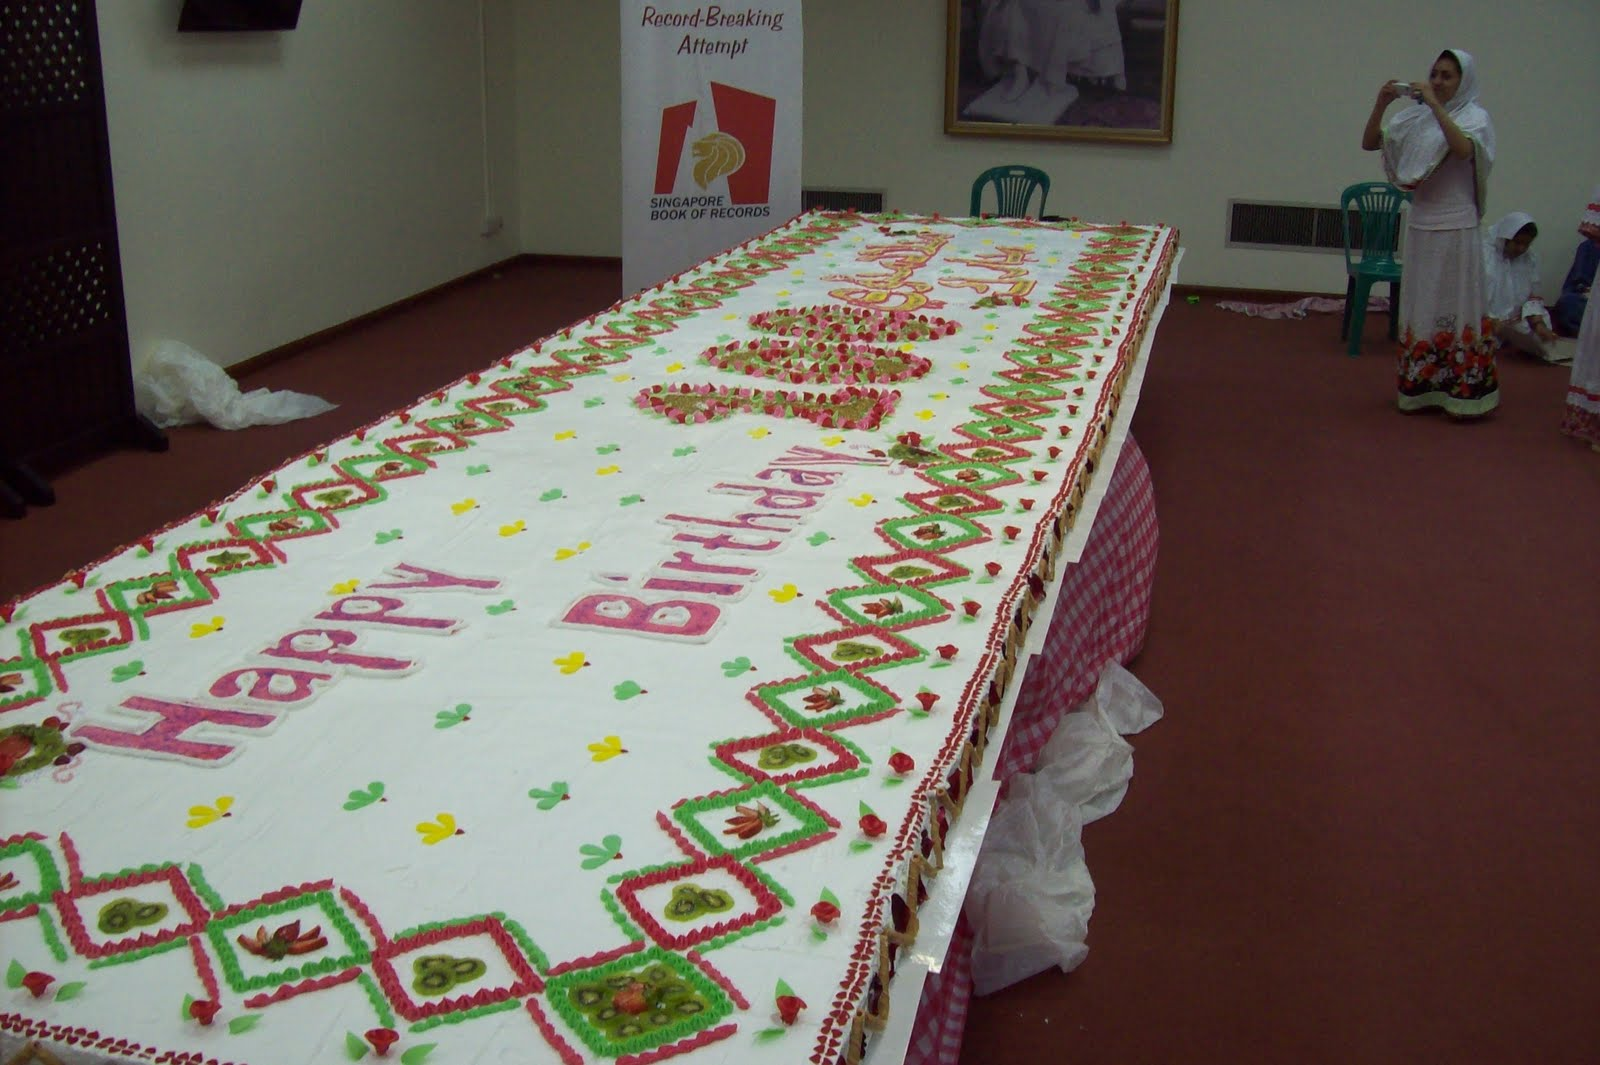 Astounding 9 Worlds Bigest Birthday Cakes Photo Worlds Biggest Cake Funny Birthday Cards Online Barepcheapnameinfo